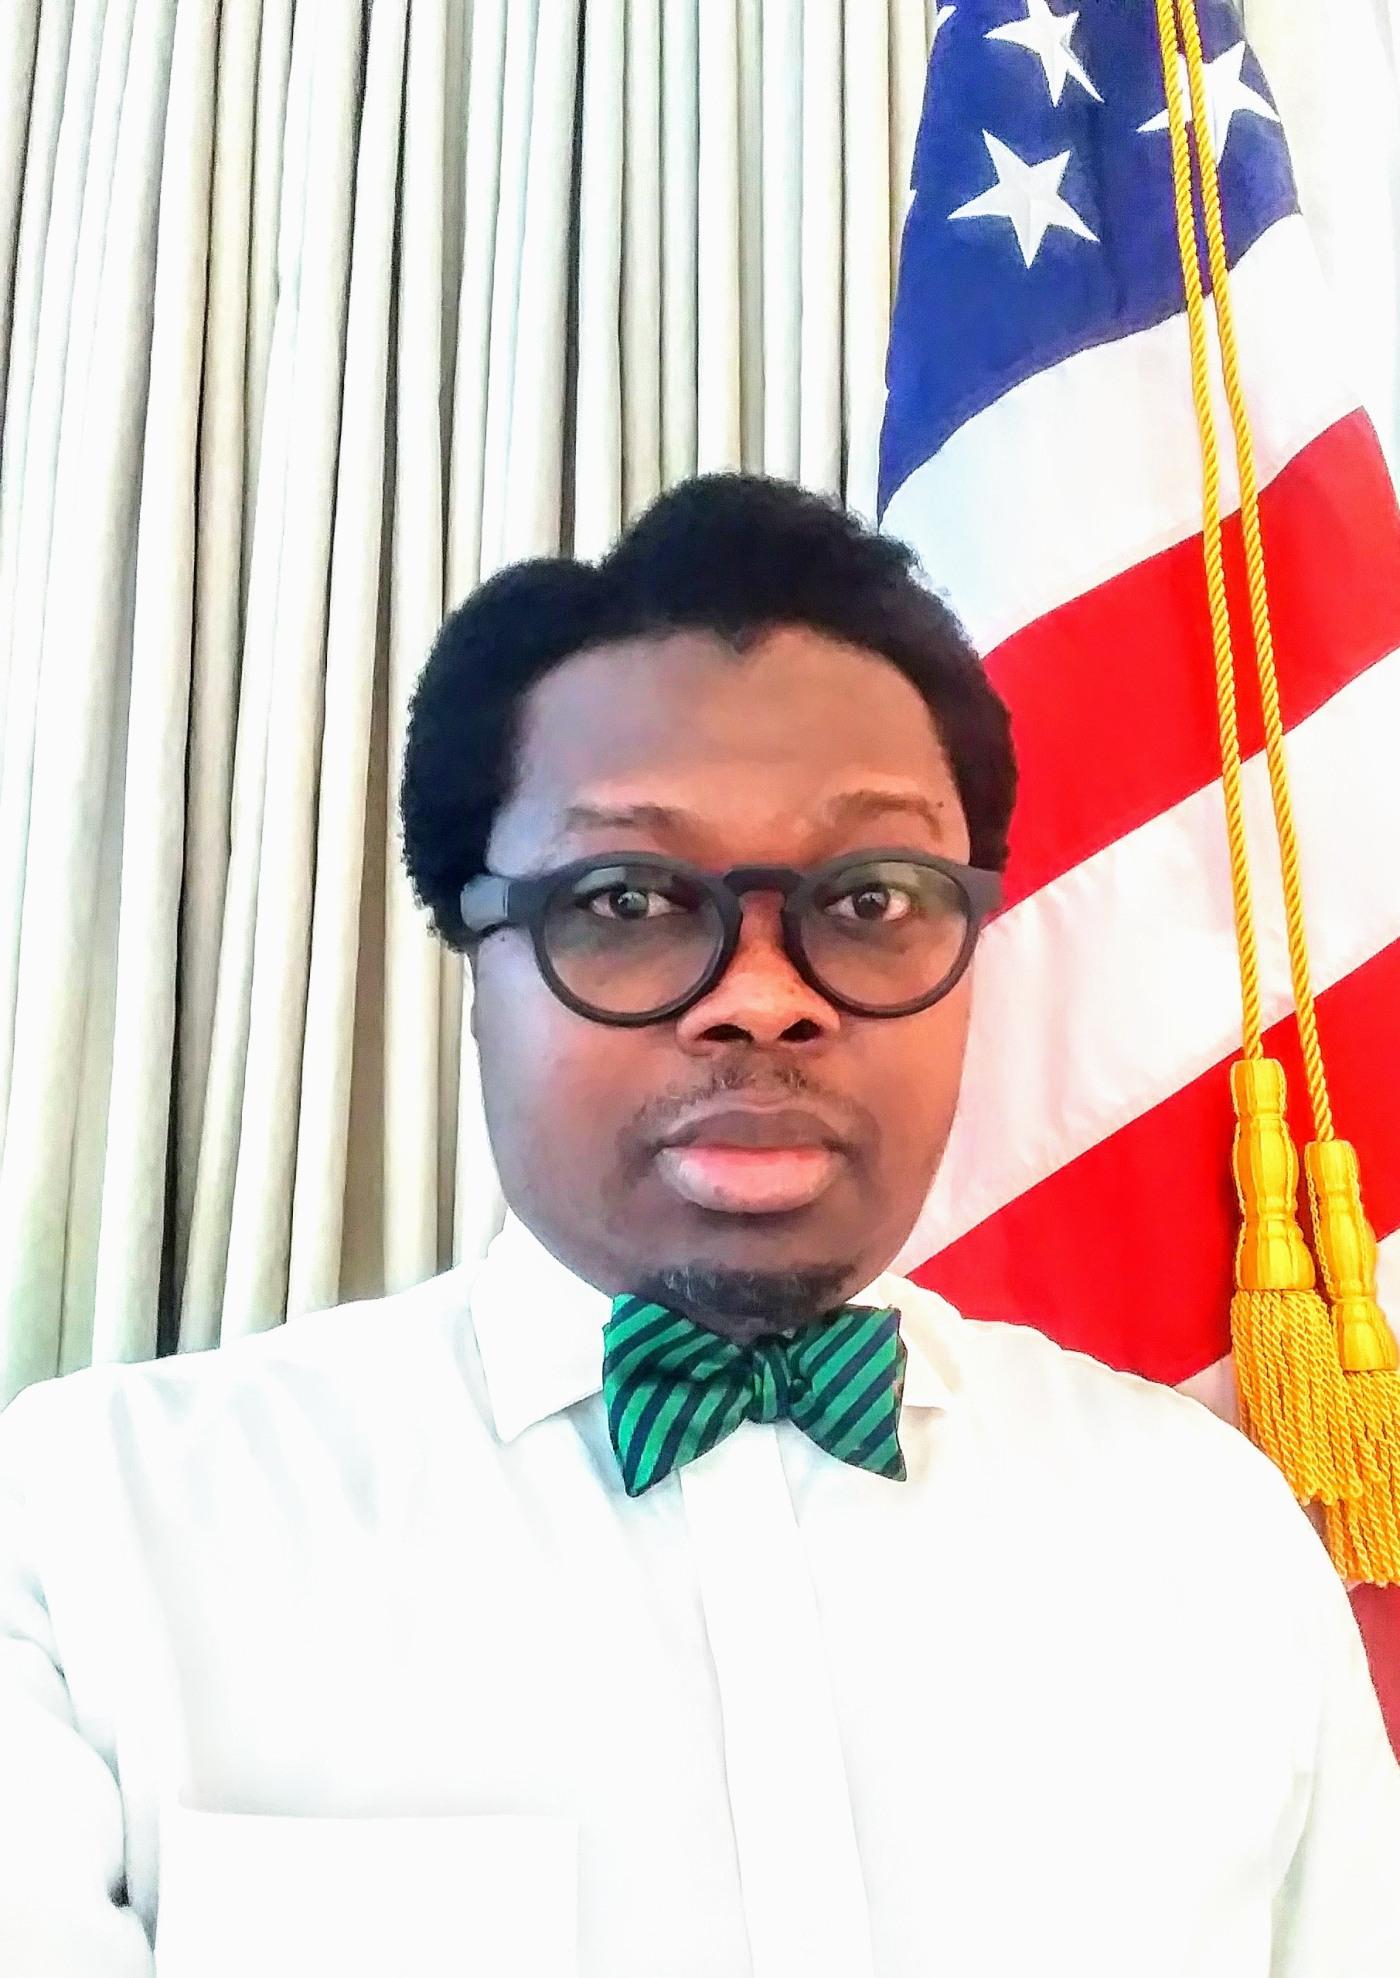 Alumni: Wilfred Agbenyikey